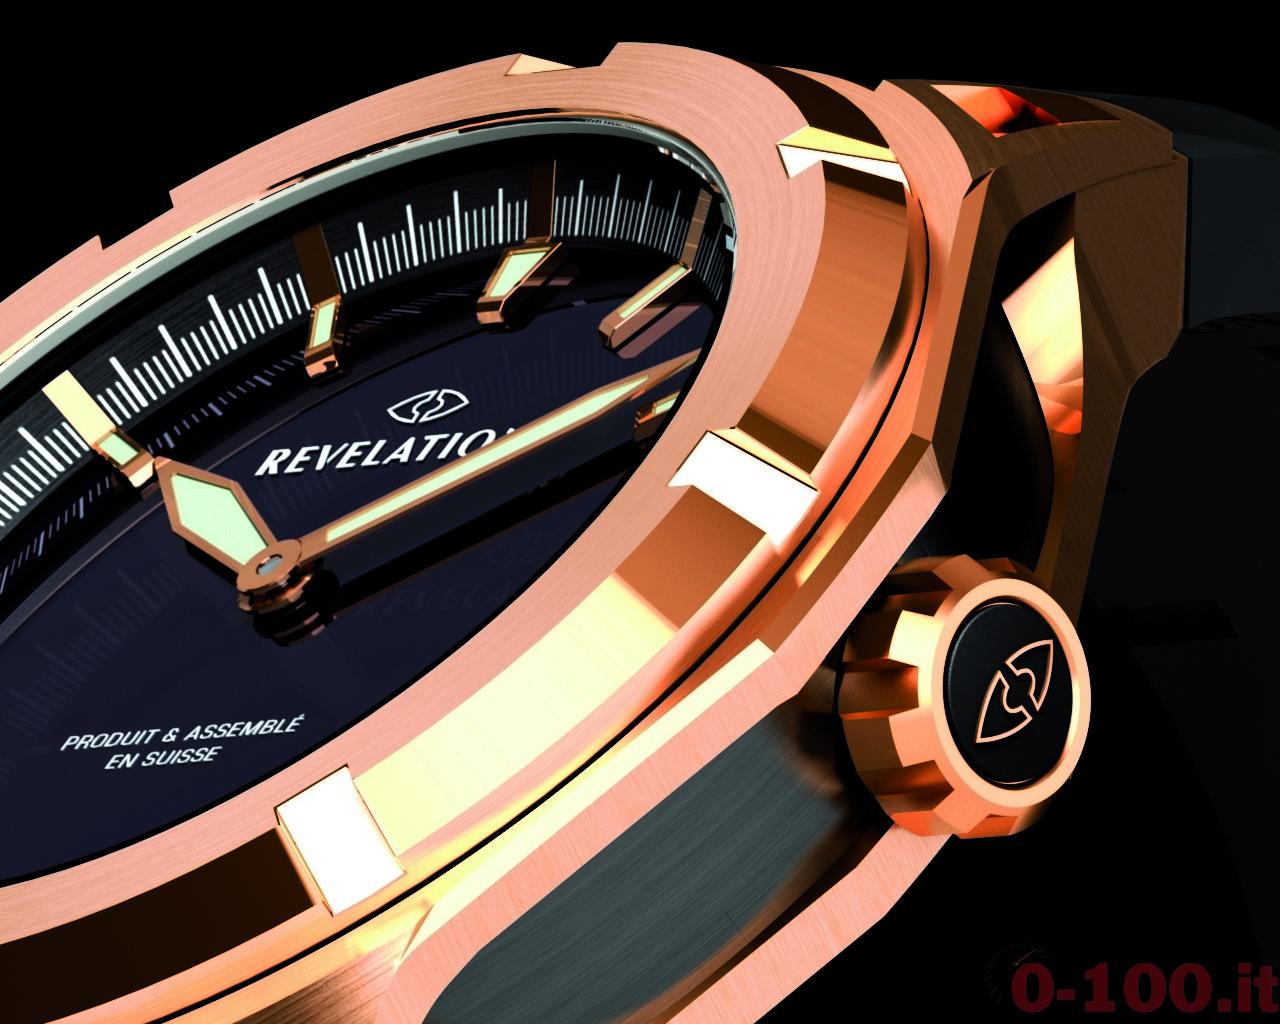 anteprima-baselworld-2014-revelation-r04-tourbillon-magical-watch-dial_0-1003